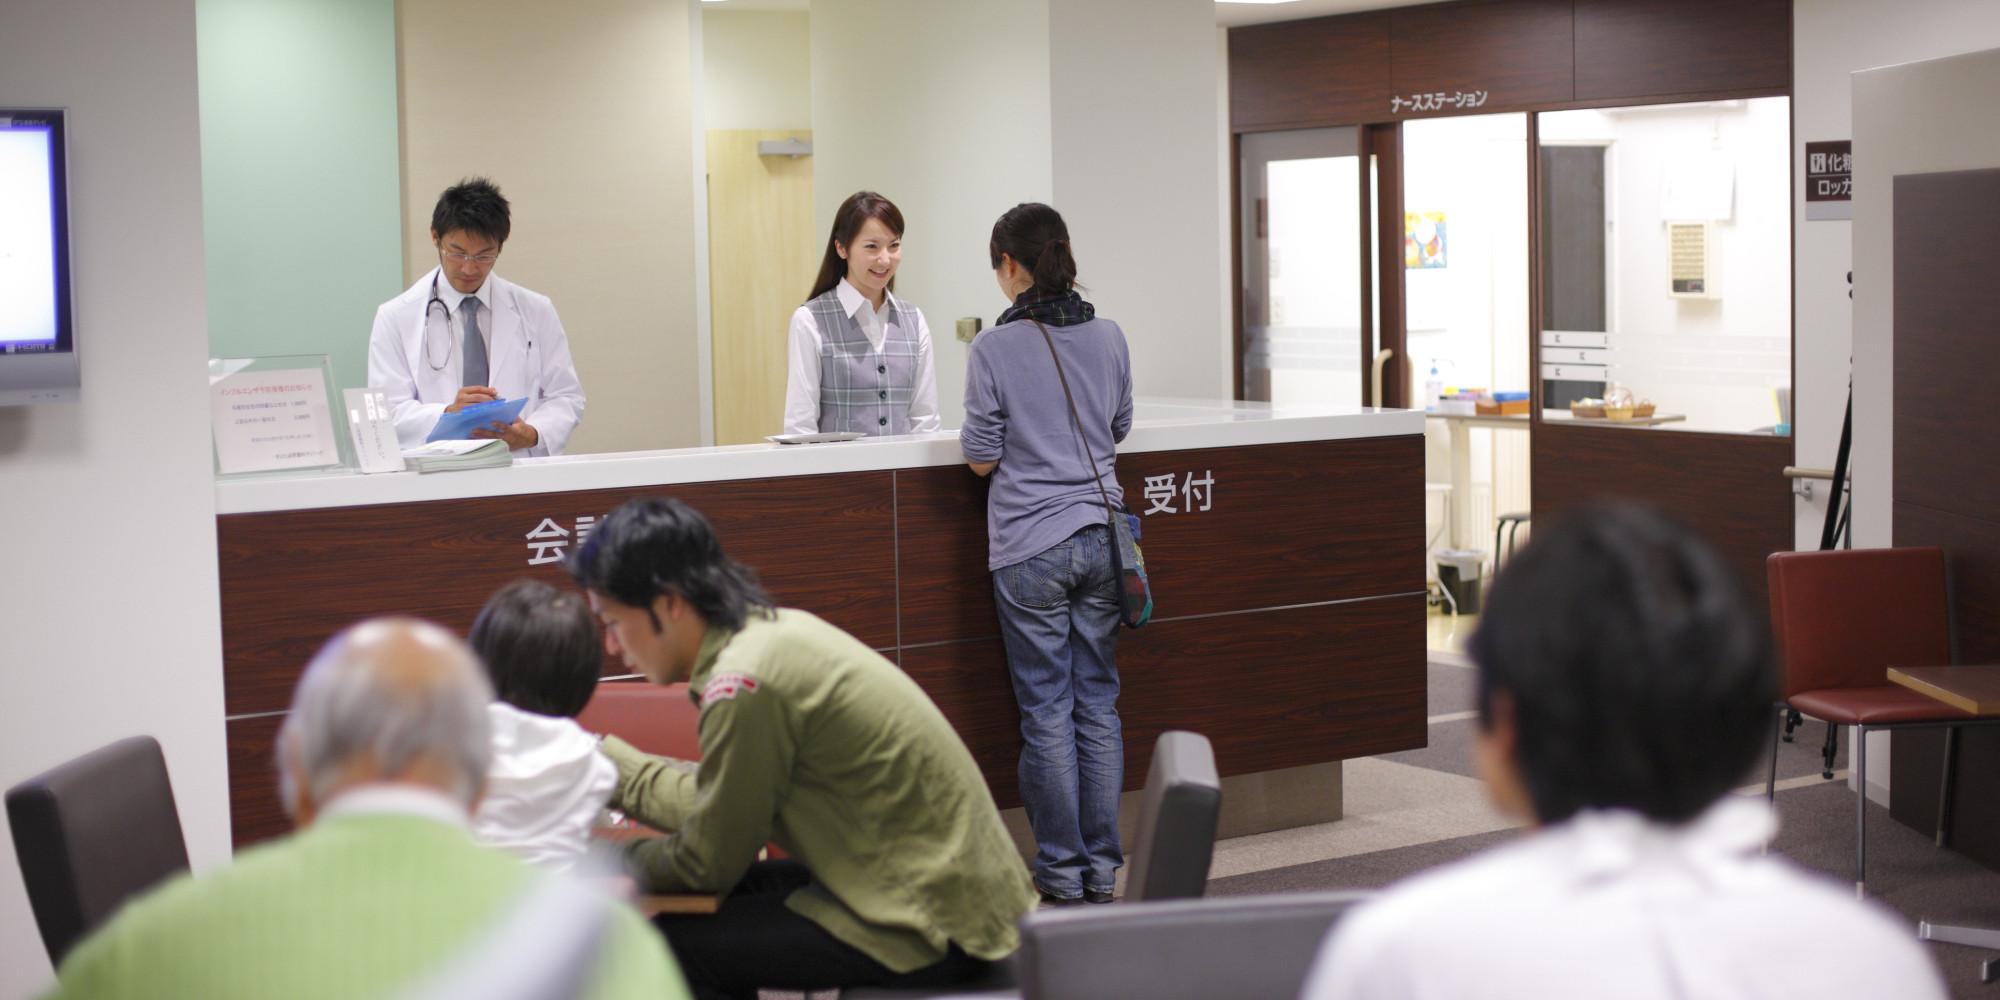 Japan Hospital Waiting Room